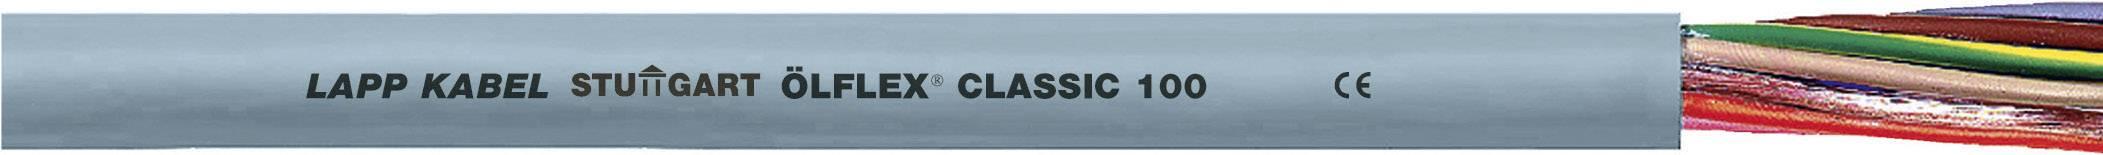 Kabel LappKabel Ölflex CLASSIC 100 7G10 (0010111), PVC, 21,7 mm, 750 V, šedá, 500 m